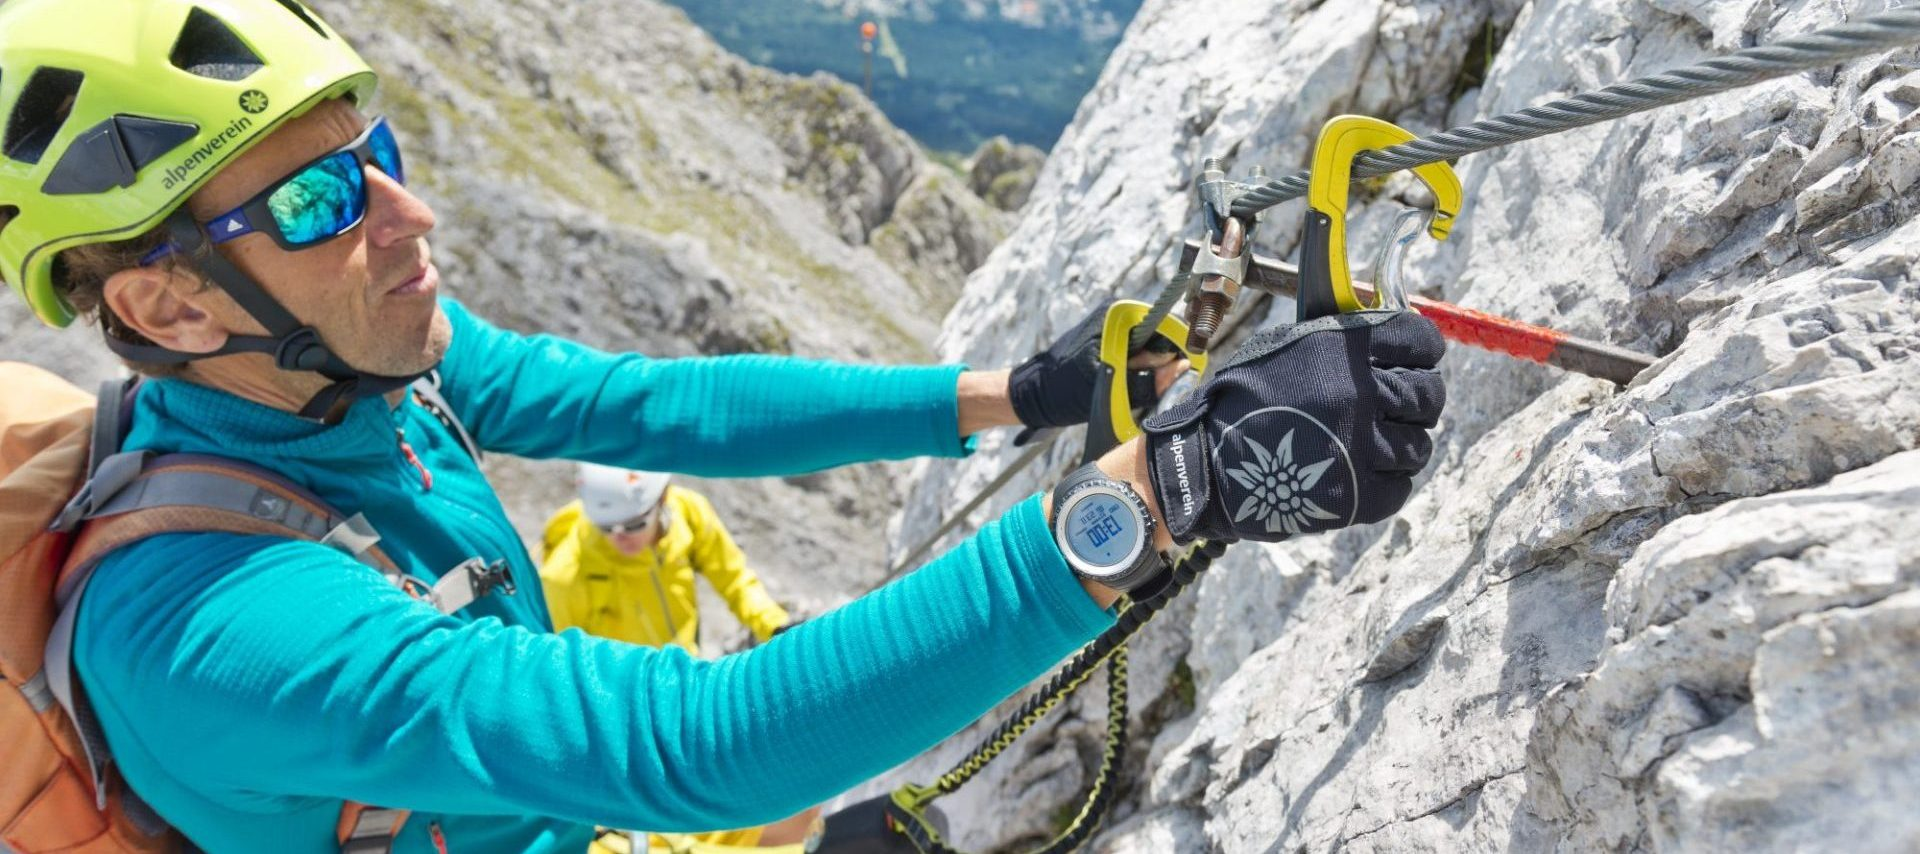 Bergsteigertipp: Sicher am Klettersteig